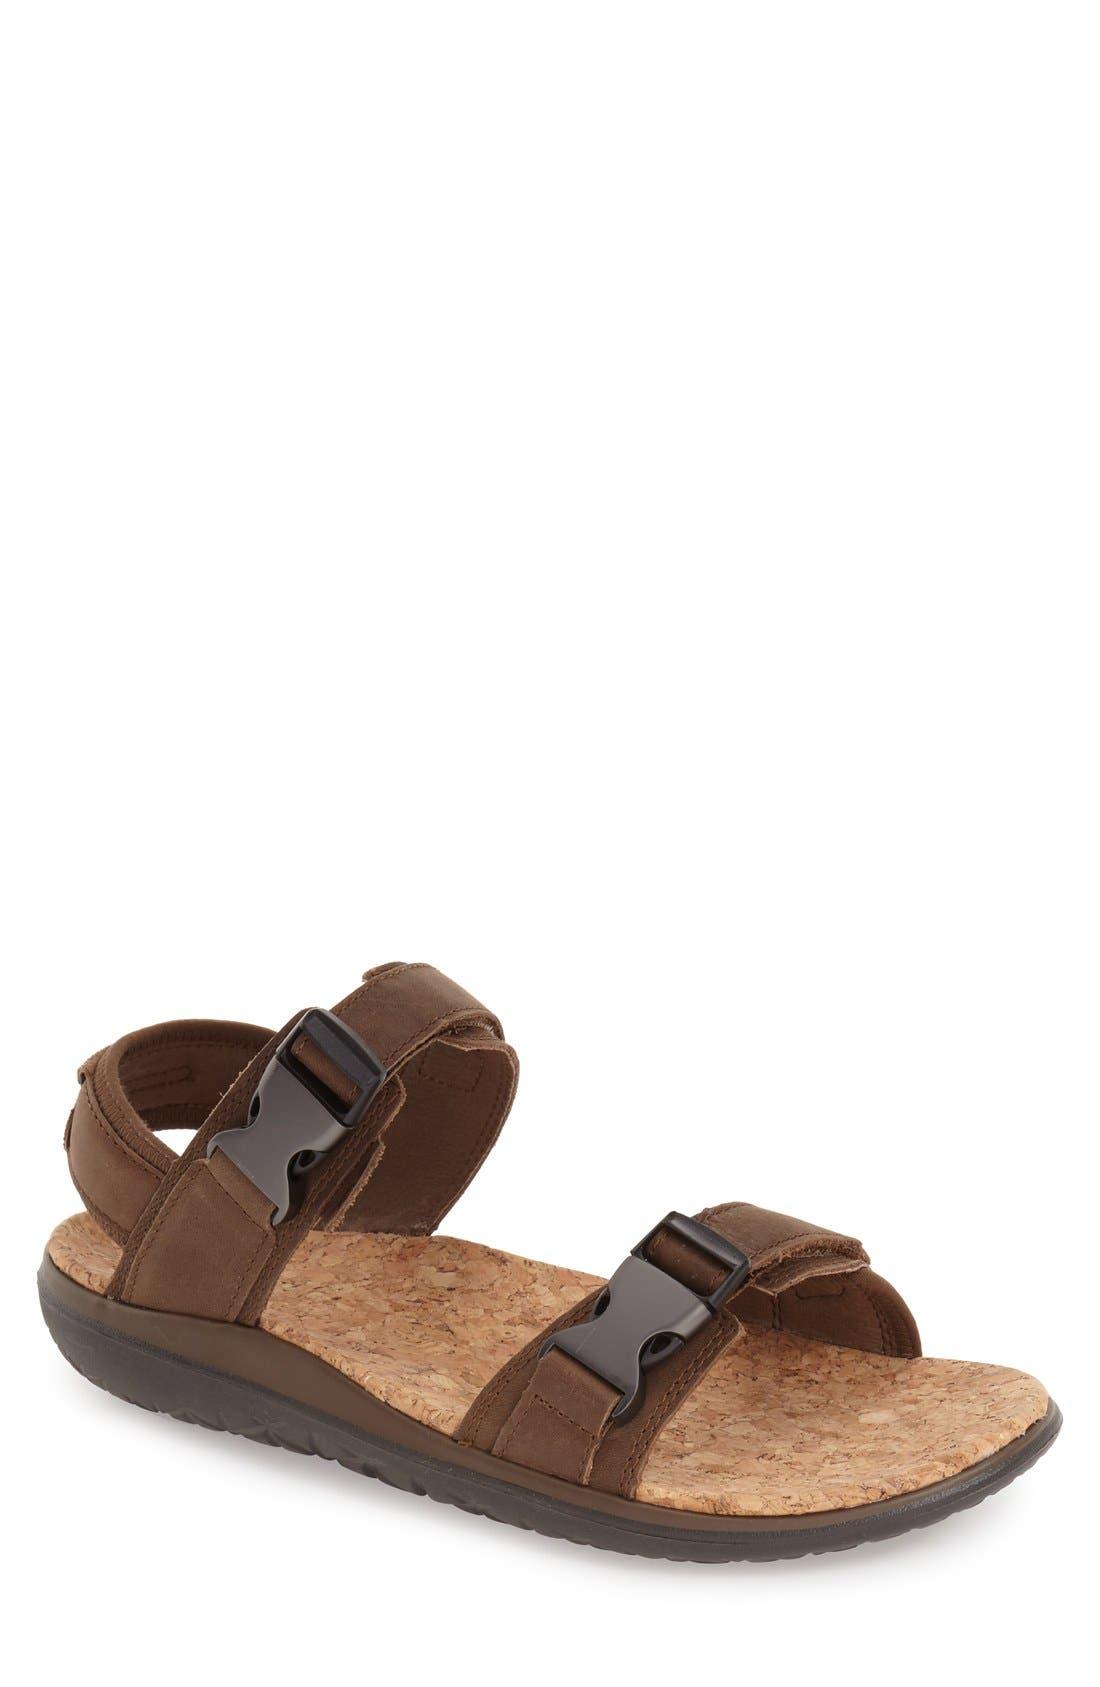 Main Image - Teva 'Terra-Float Universal Lux' Sport Sandal (Men)